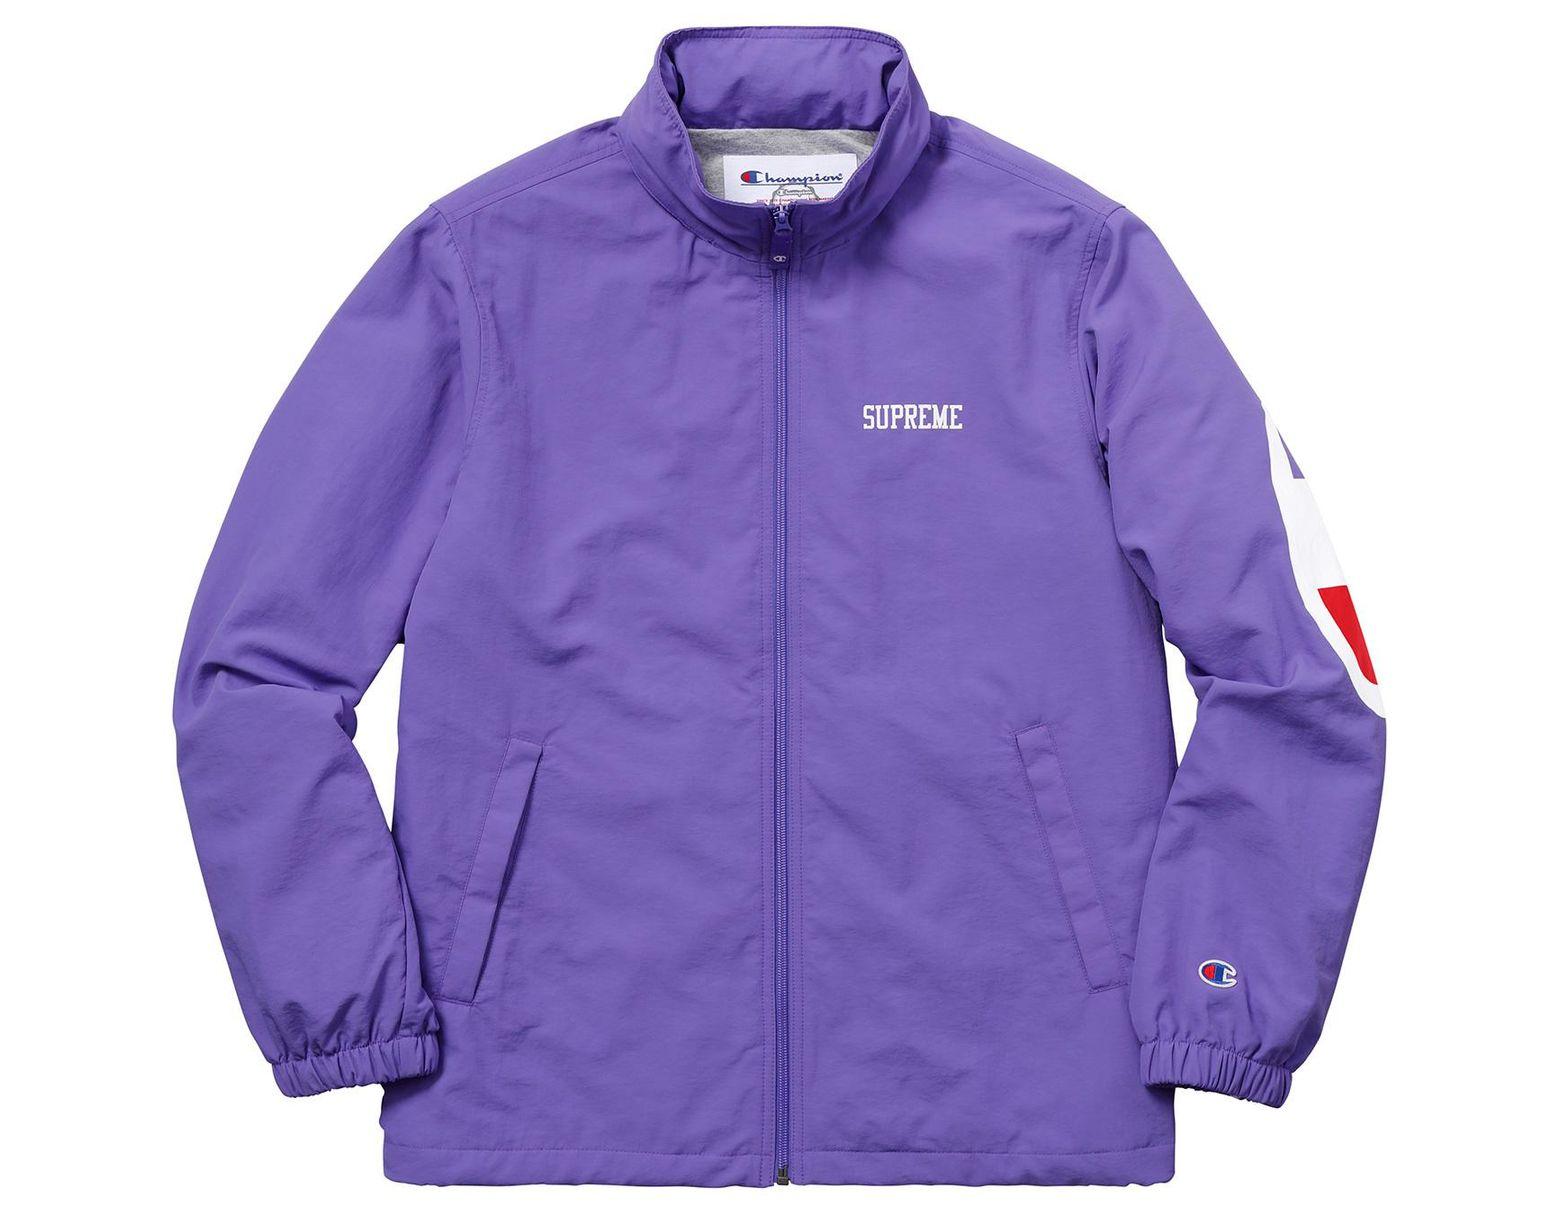 Supreme In Purple Champion Men Lyst Light Jacket For Track 5LRAj4